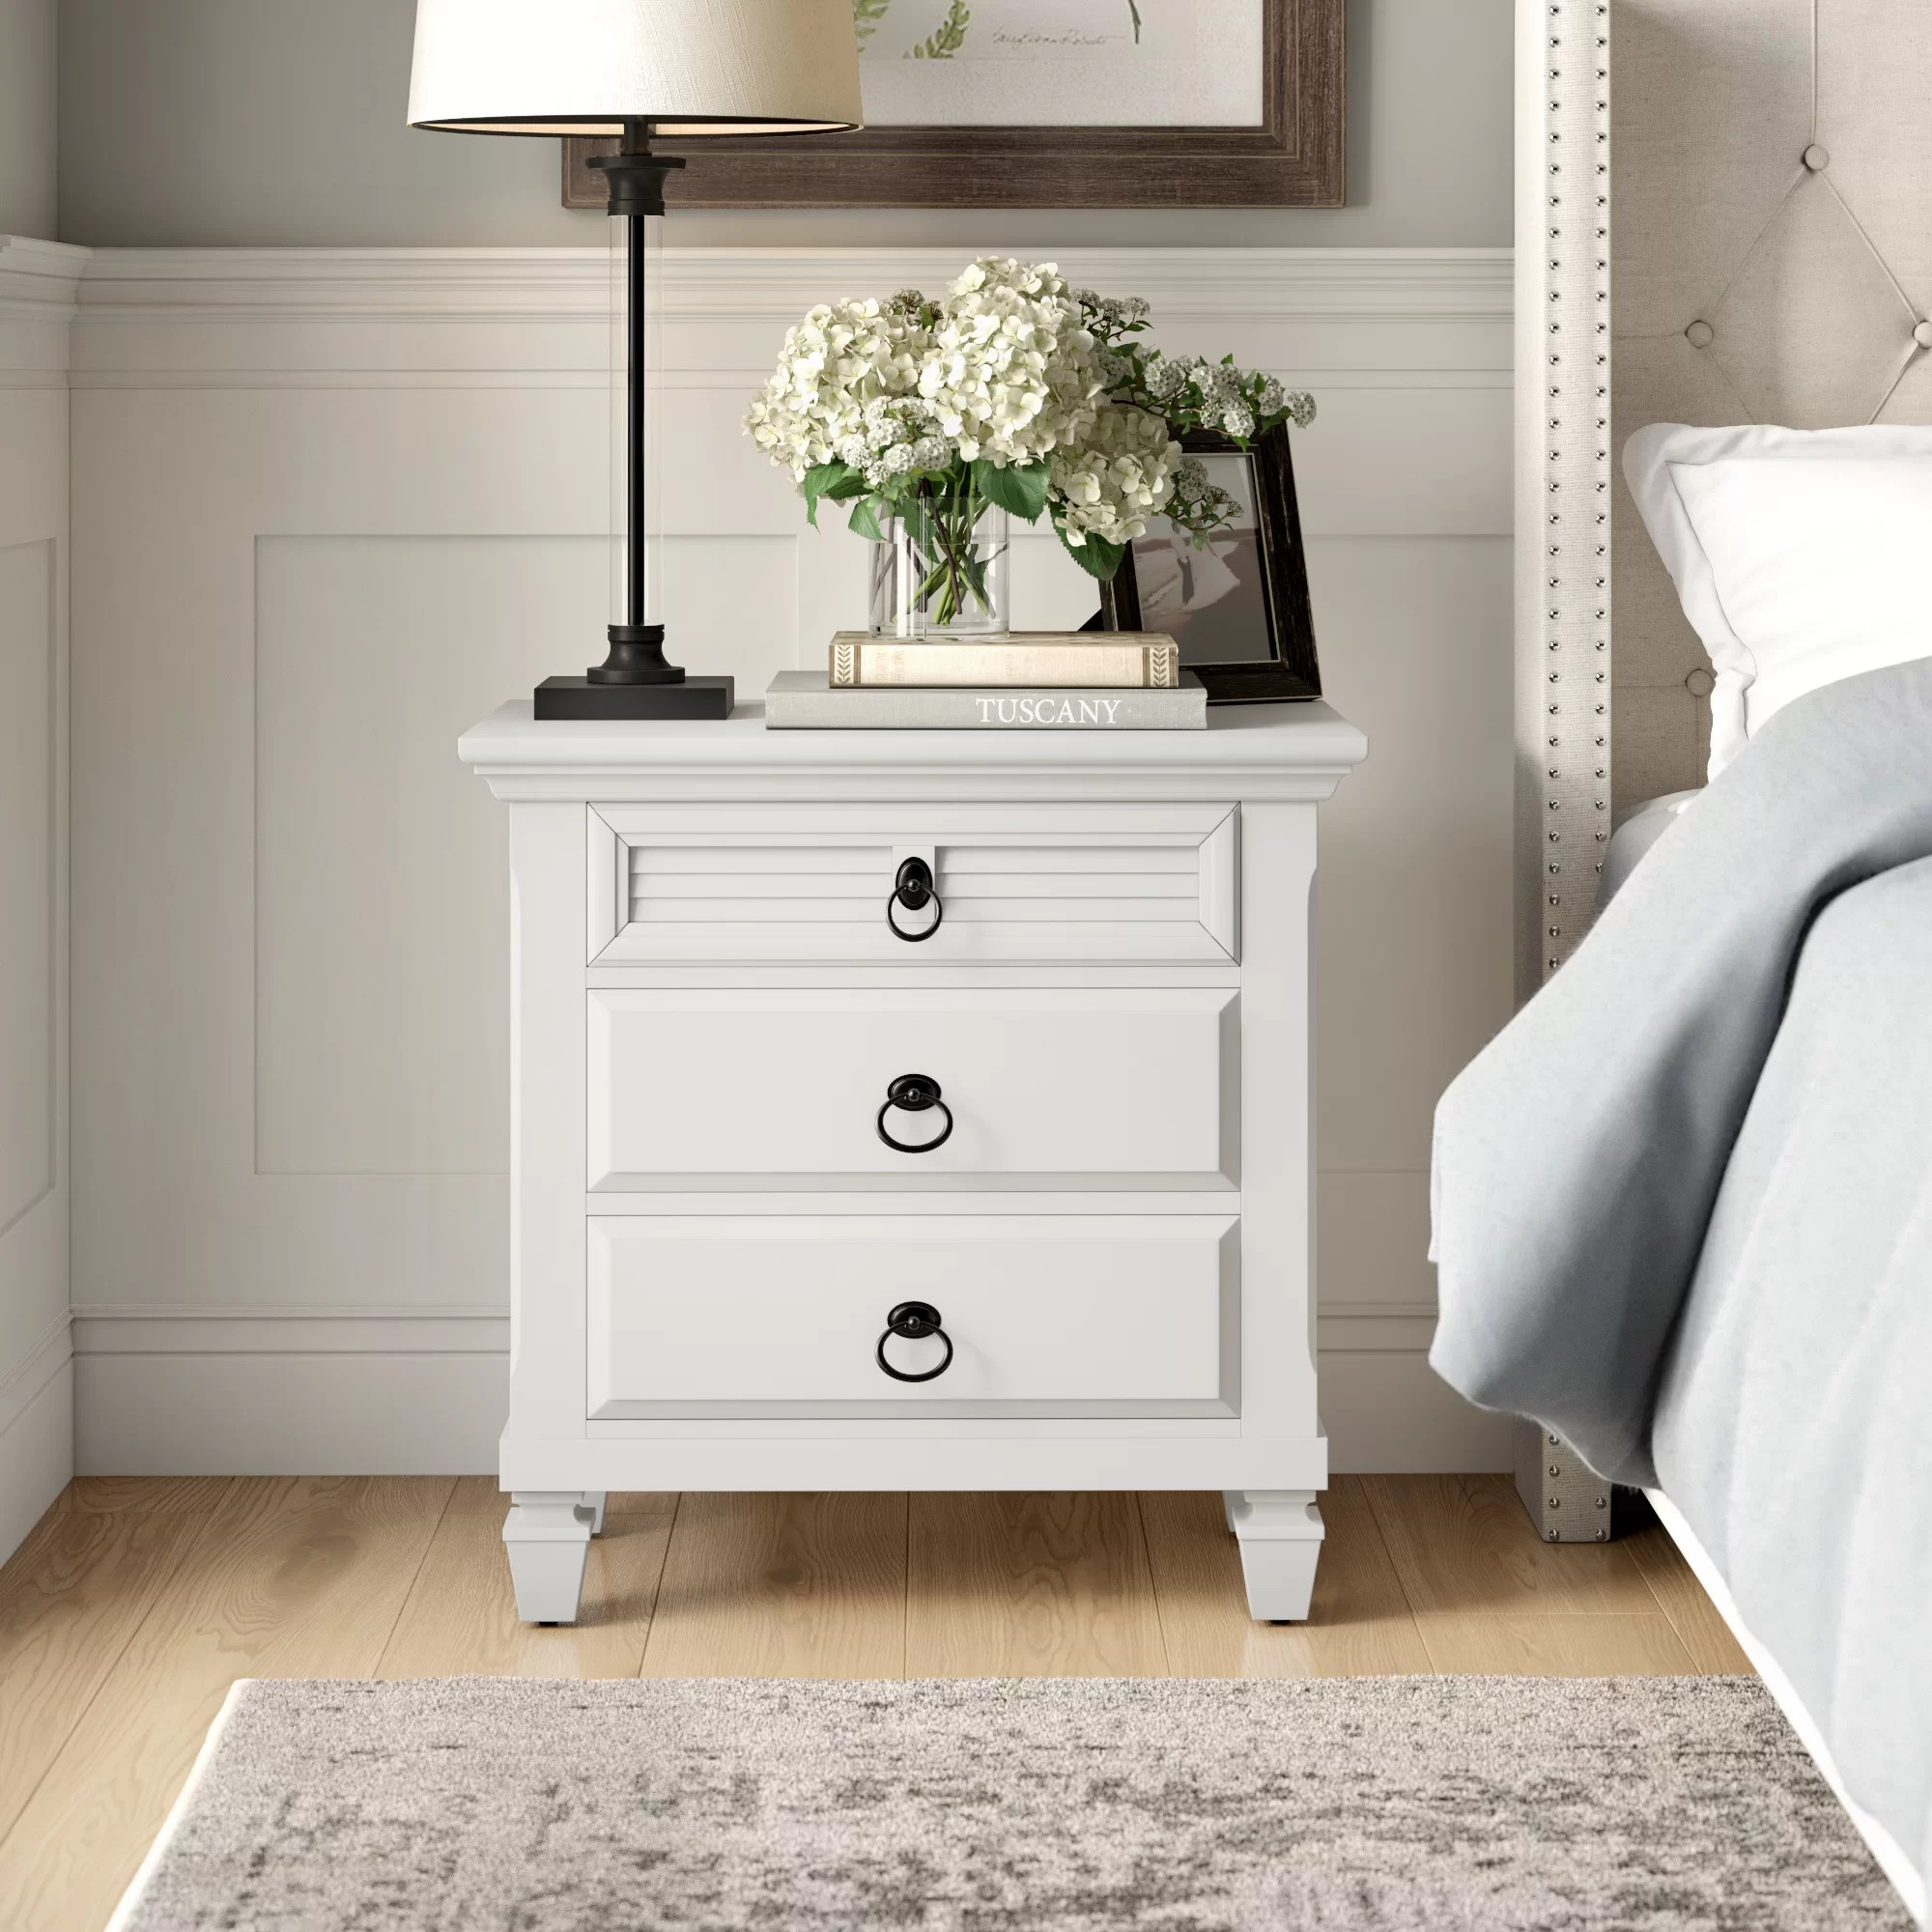 coastal nightstands you ll love in 2021